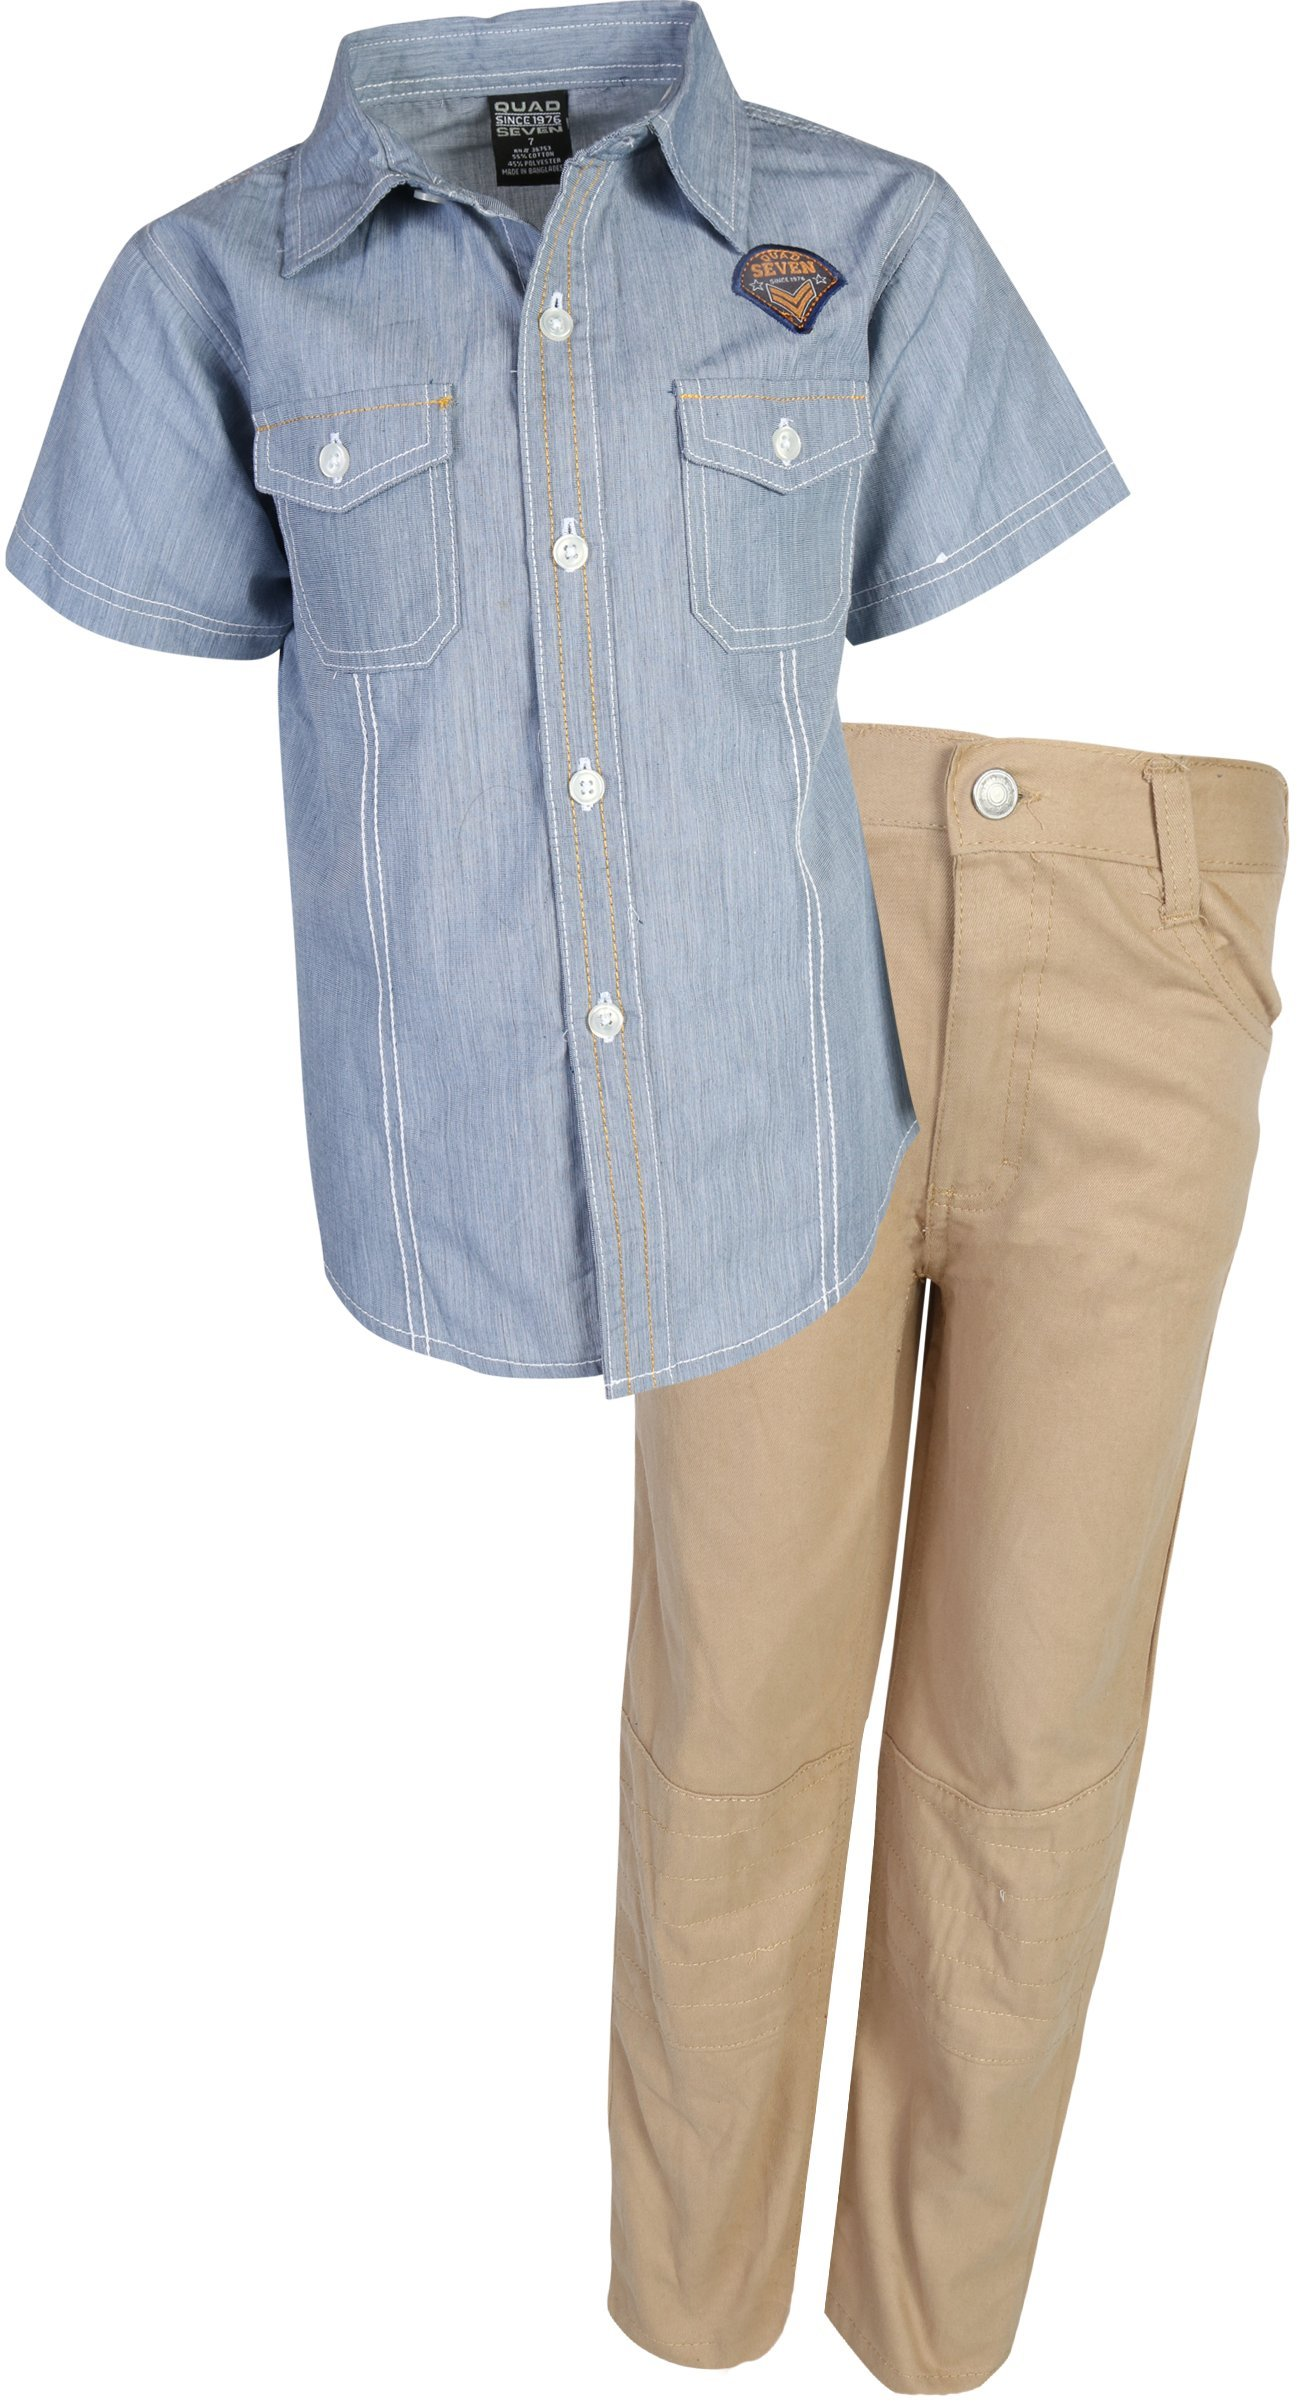 Quad Seven Boys Pant Set Woven Top and Twill Bottom, Blue Denim/Khaki, Size 4'